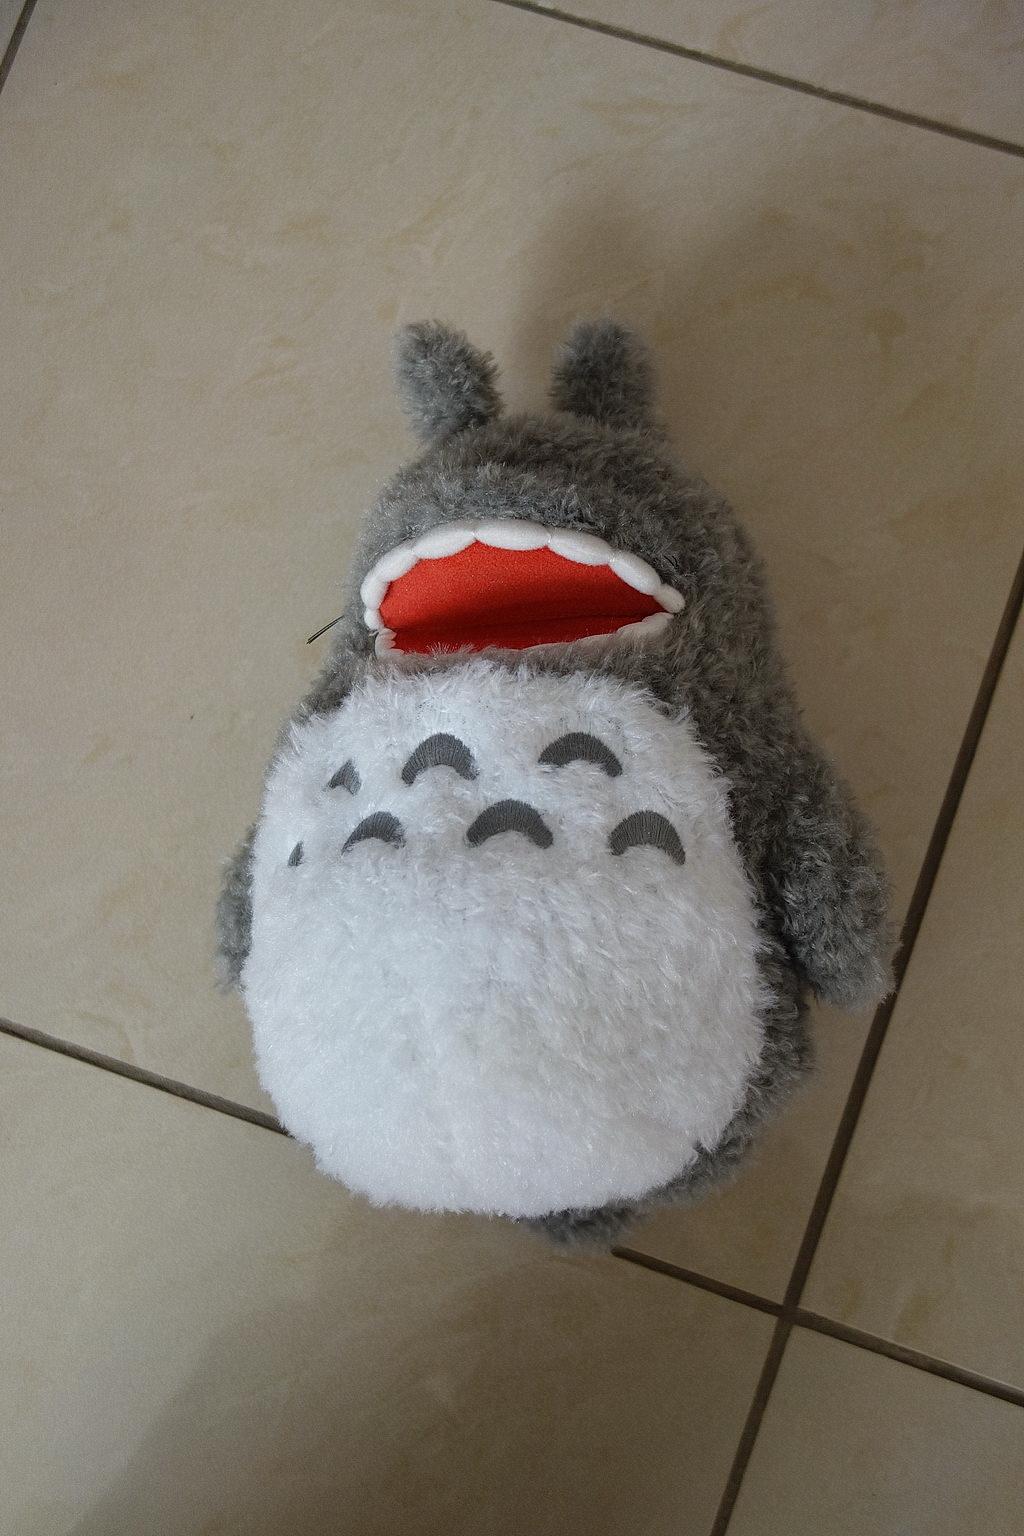 My-Neighbor-Totoro-snooze1